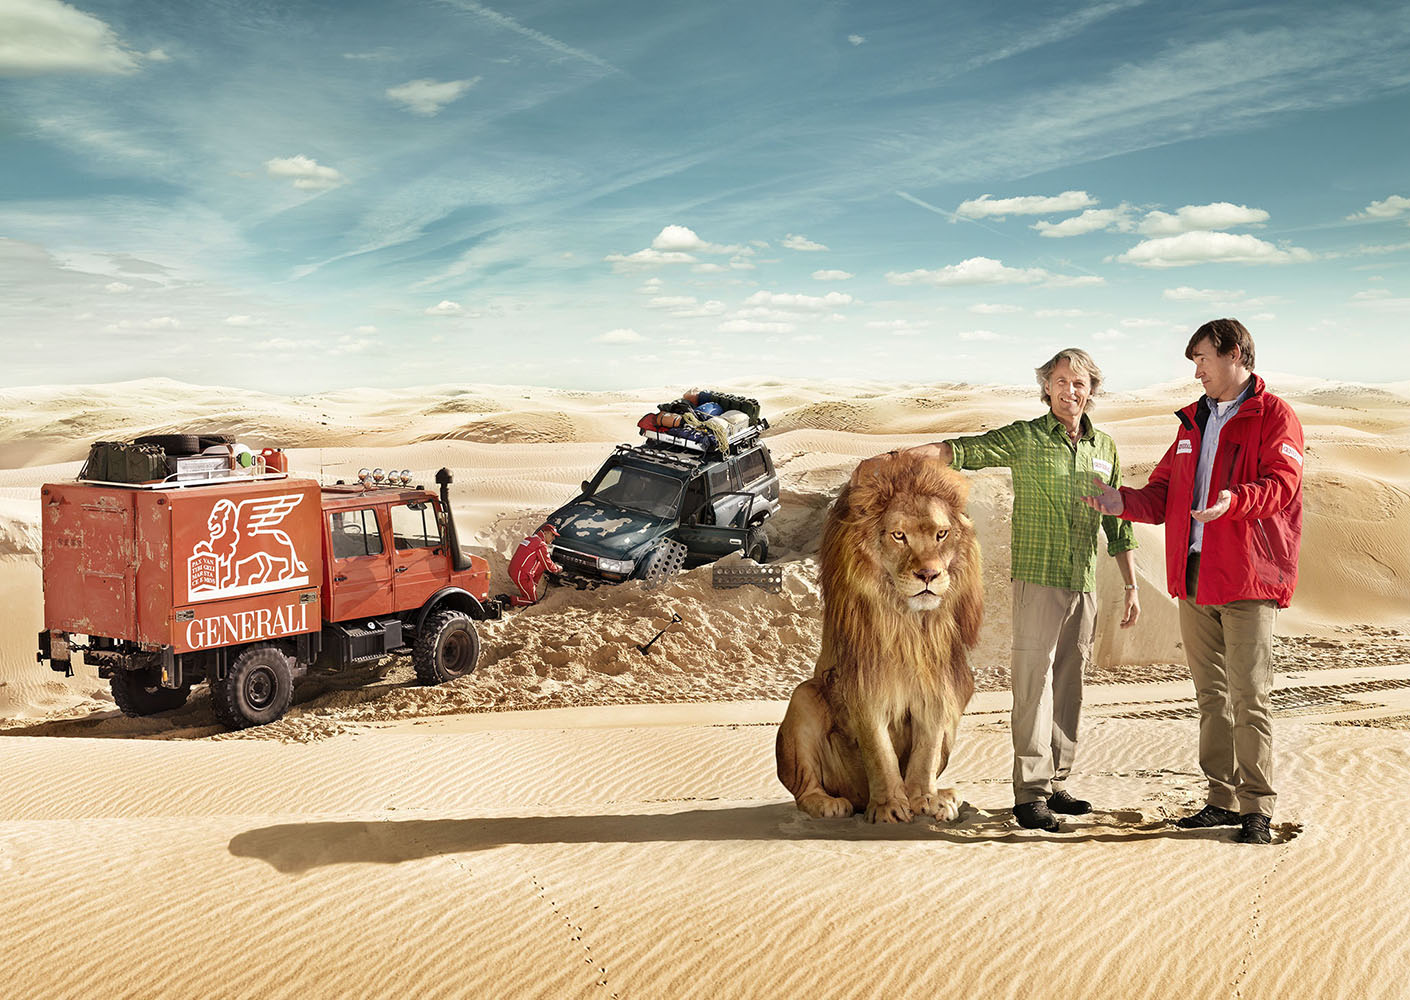 © Gonzalo Puertas Advertising Photographer. Generali: Ogilvy